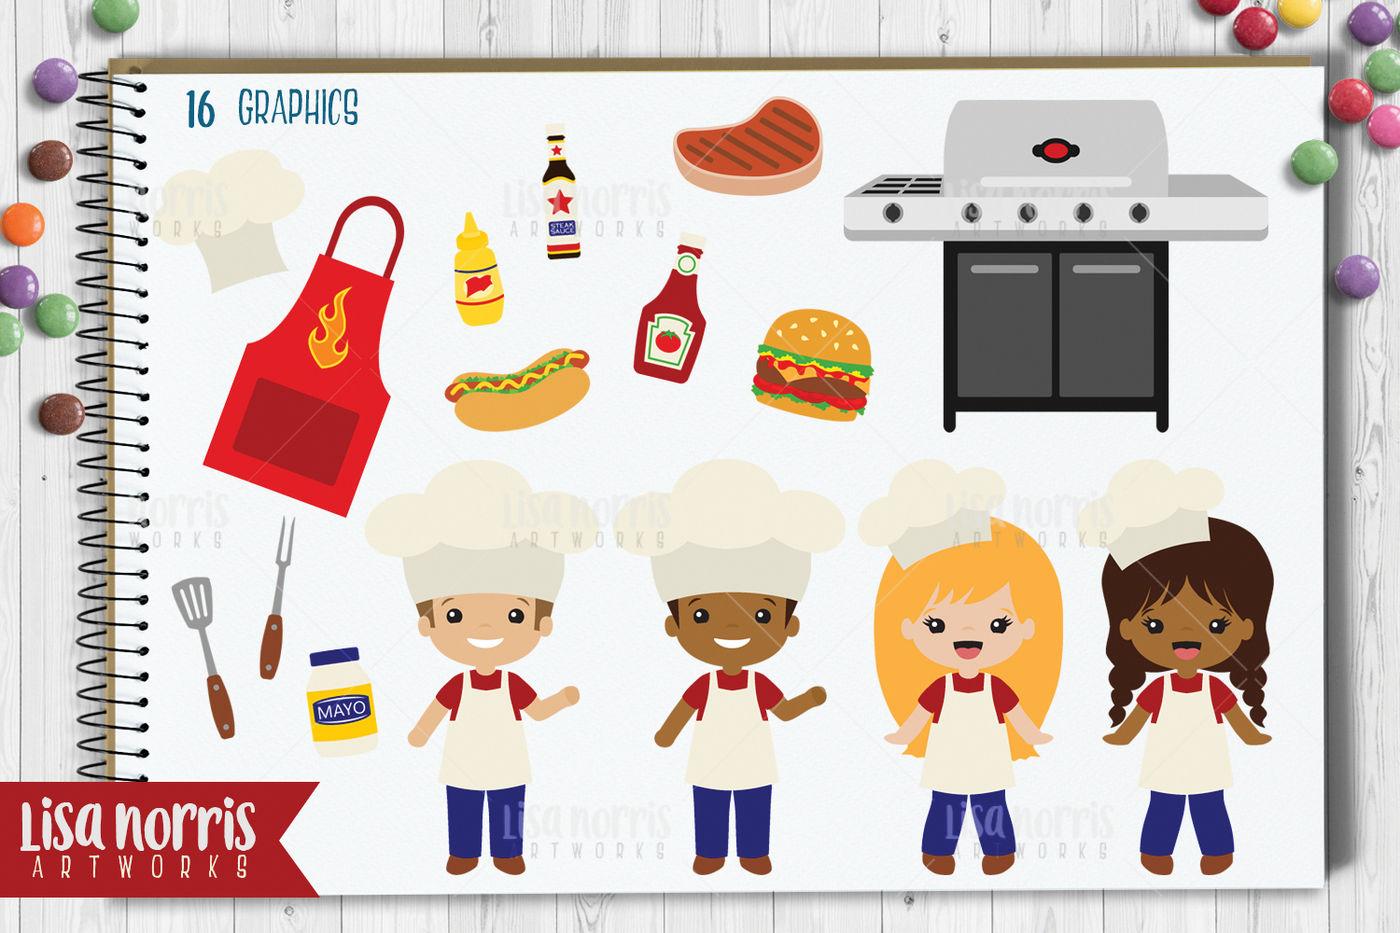 Cookout clipart artwork. Clip art graphics by